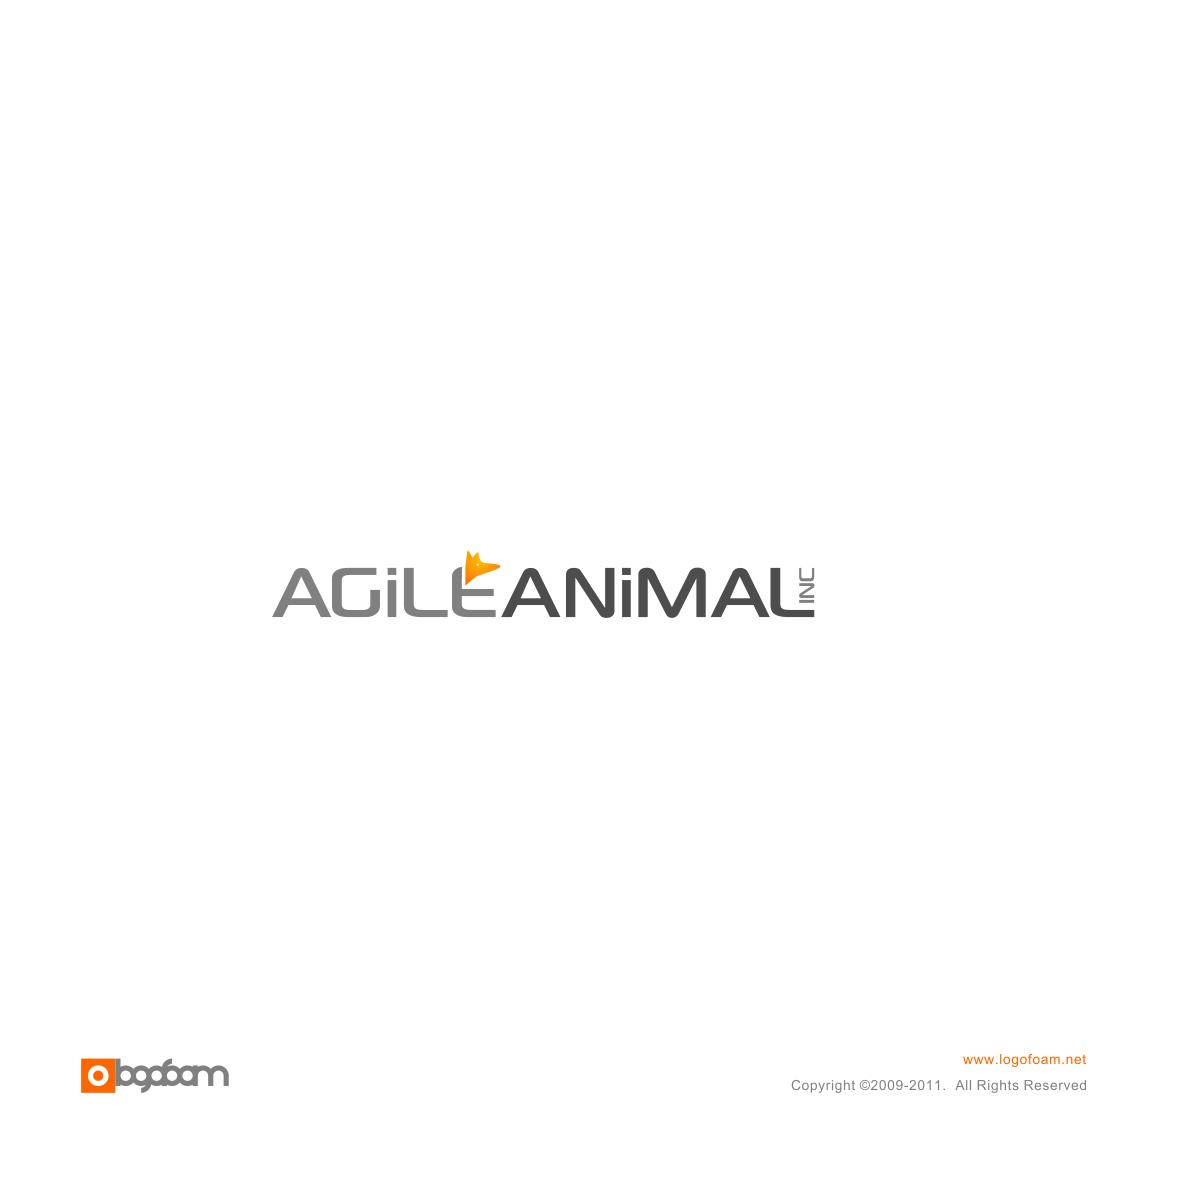 AGiLE ANiMAL INC. needs a new logo